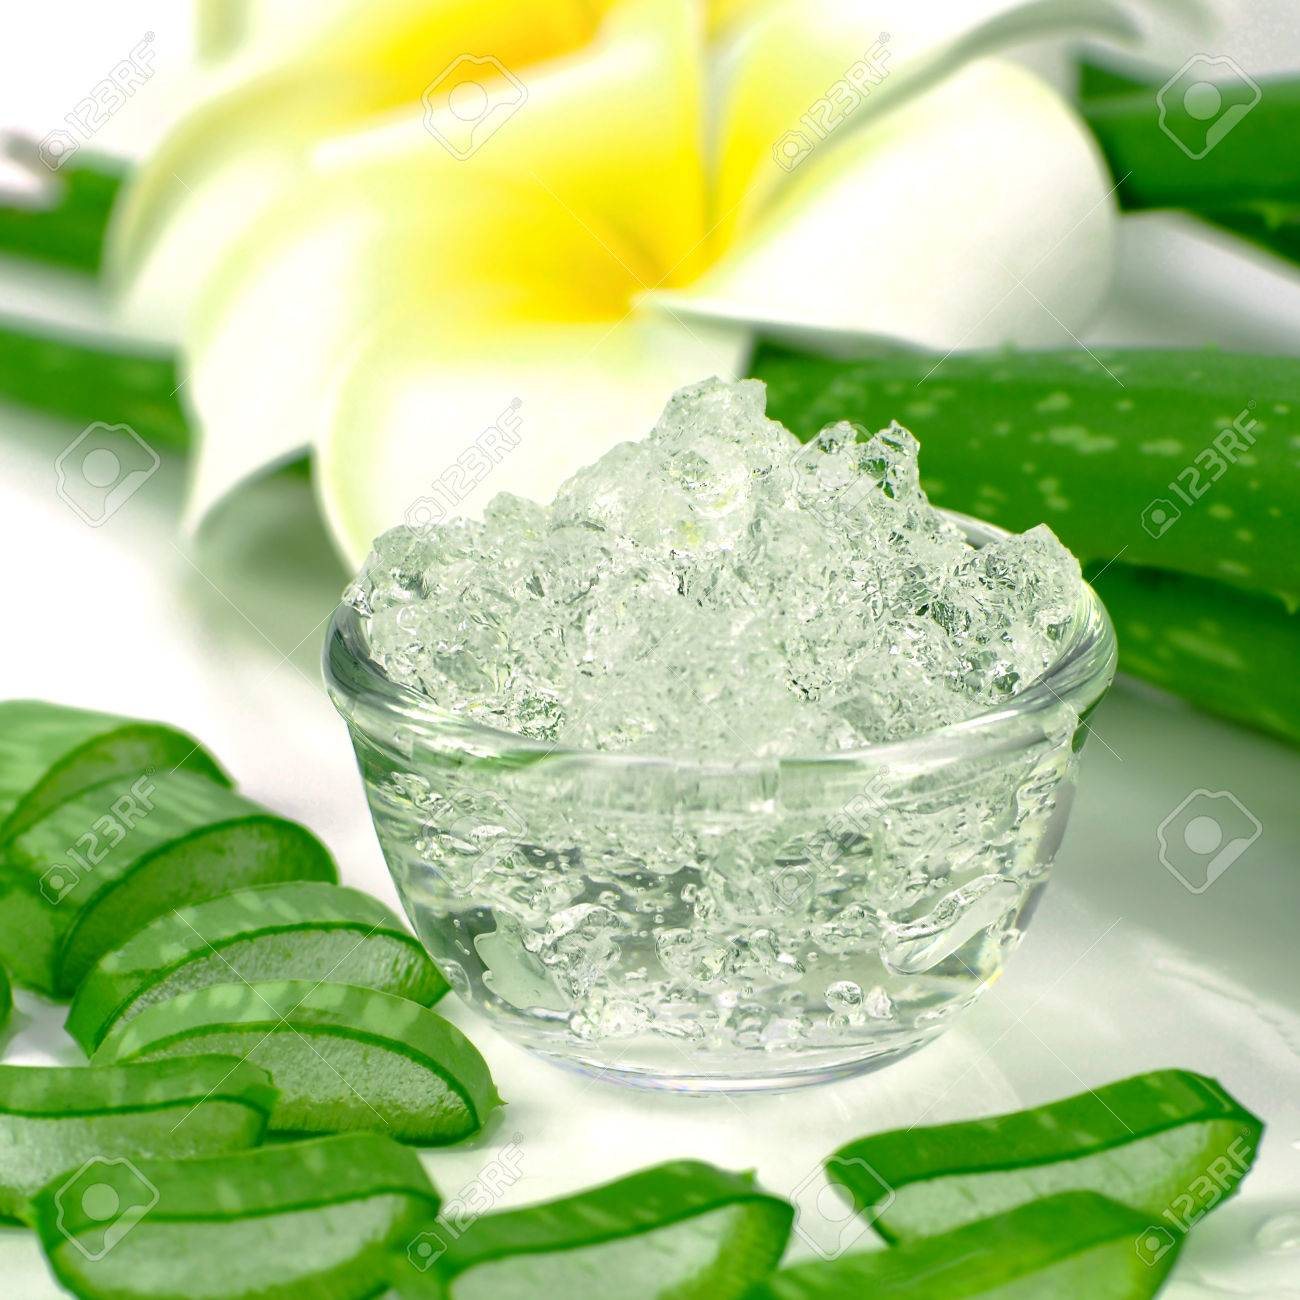 Image result for pure aloe vera gel